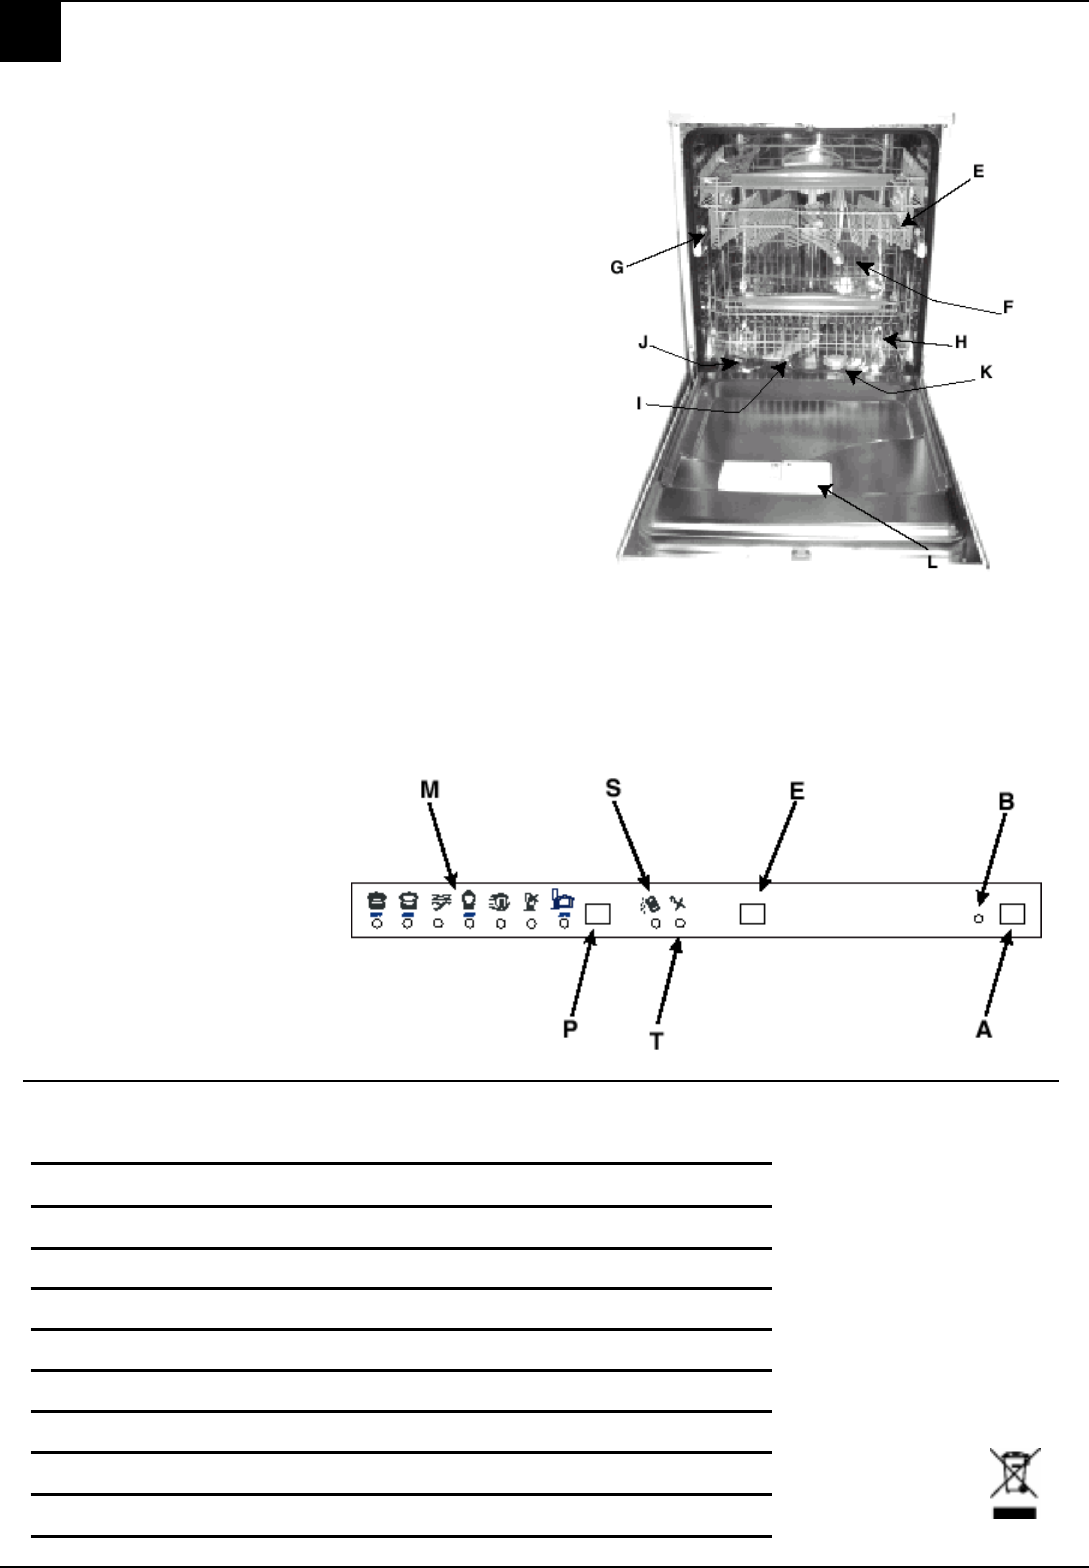 Lavastoviglie ariston elixia li 670 duo manuale d uso for Caldaia ariston egis manuale d uso